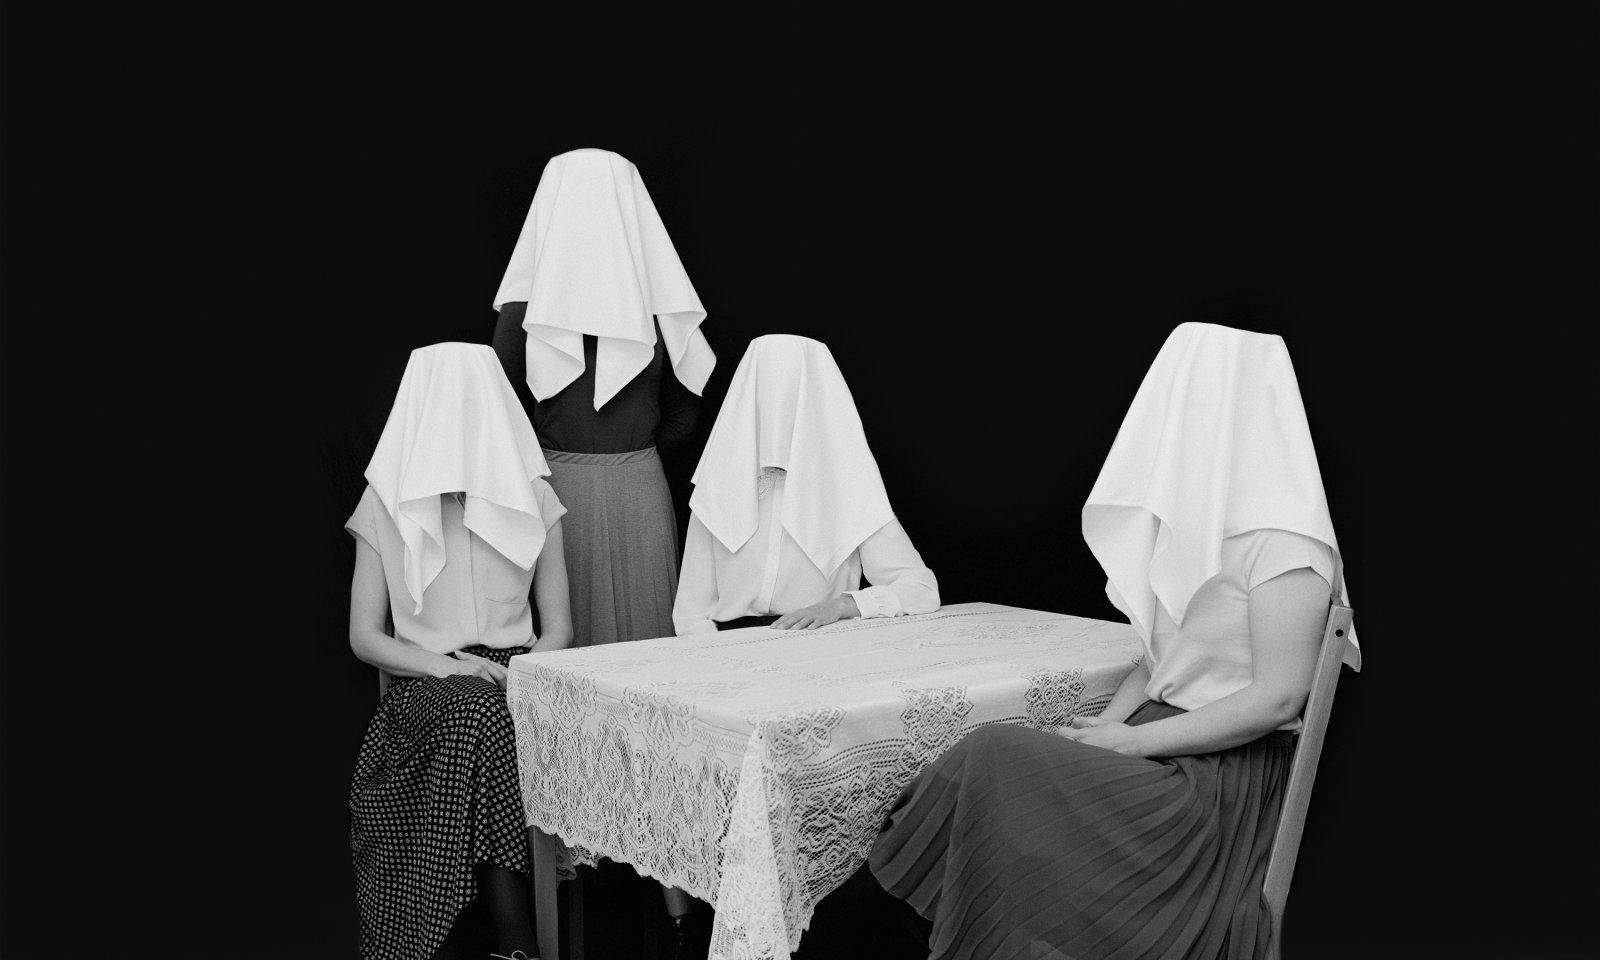 The Unseen, 2015 © Tereza Zelenkova